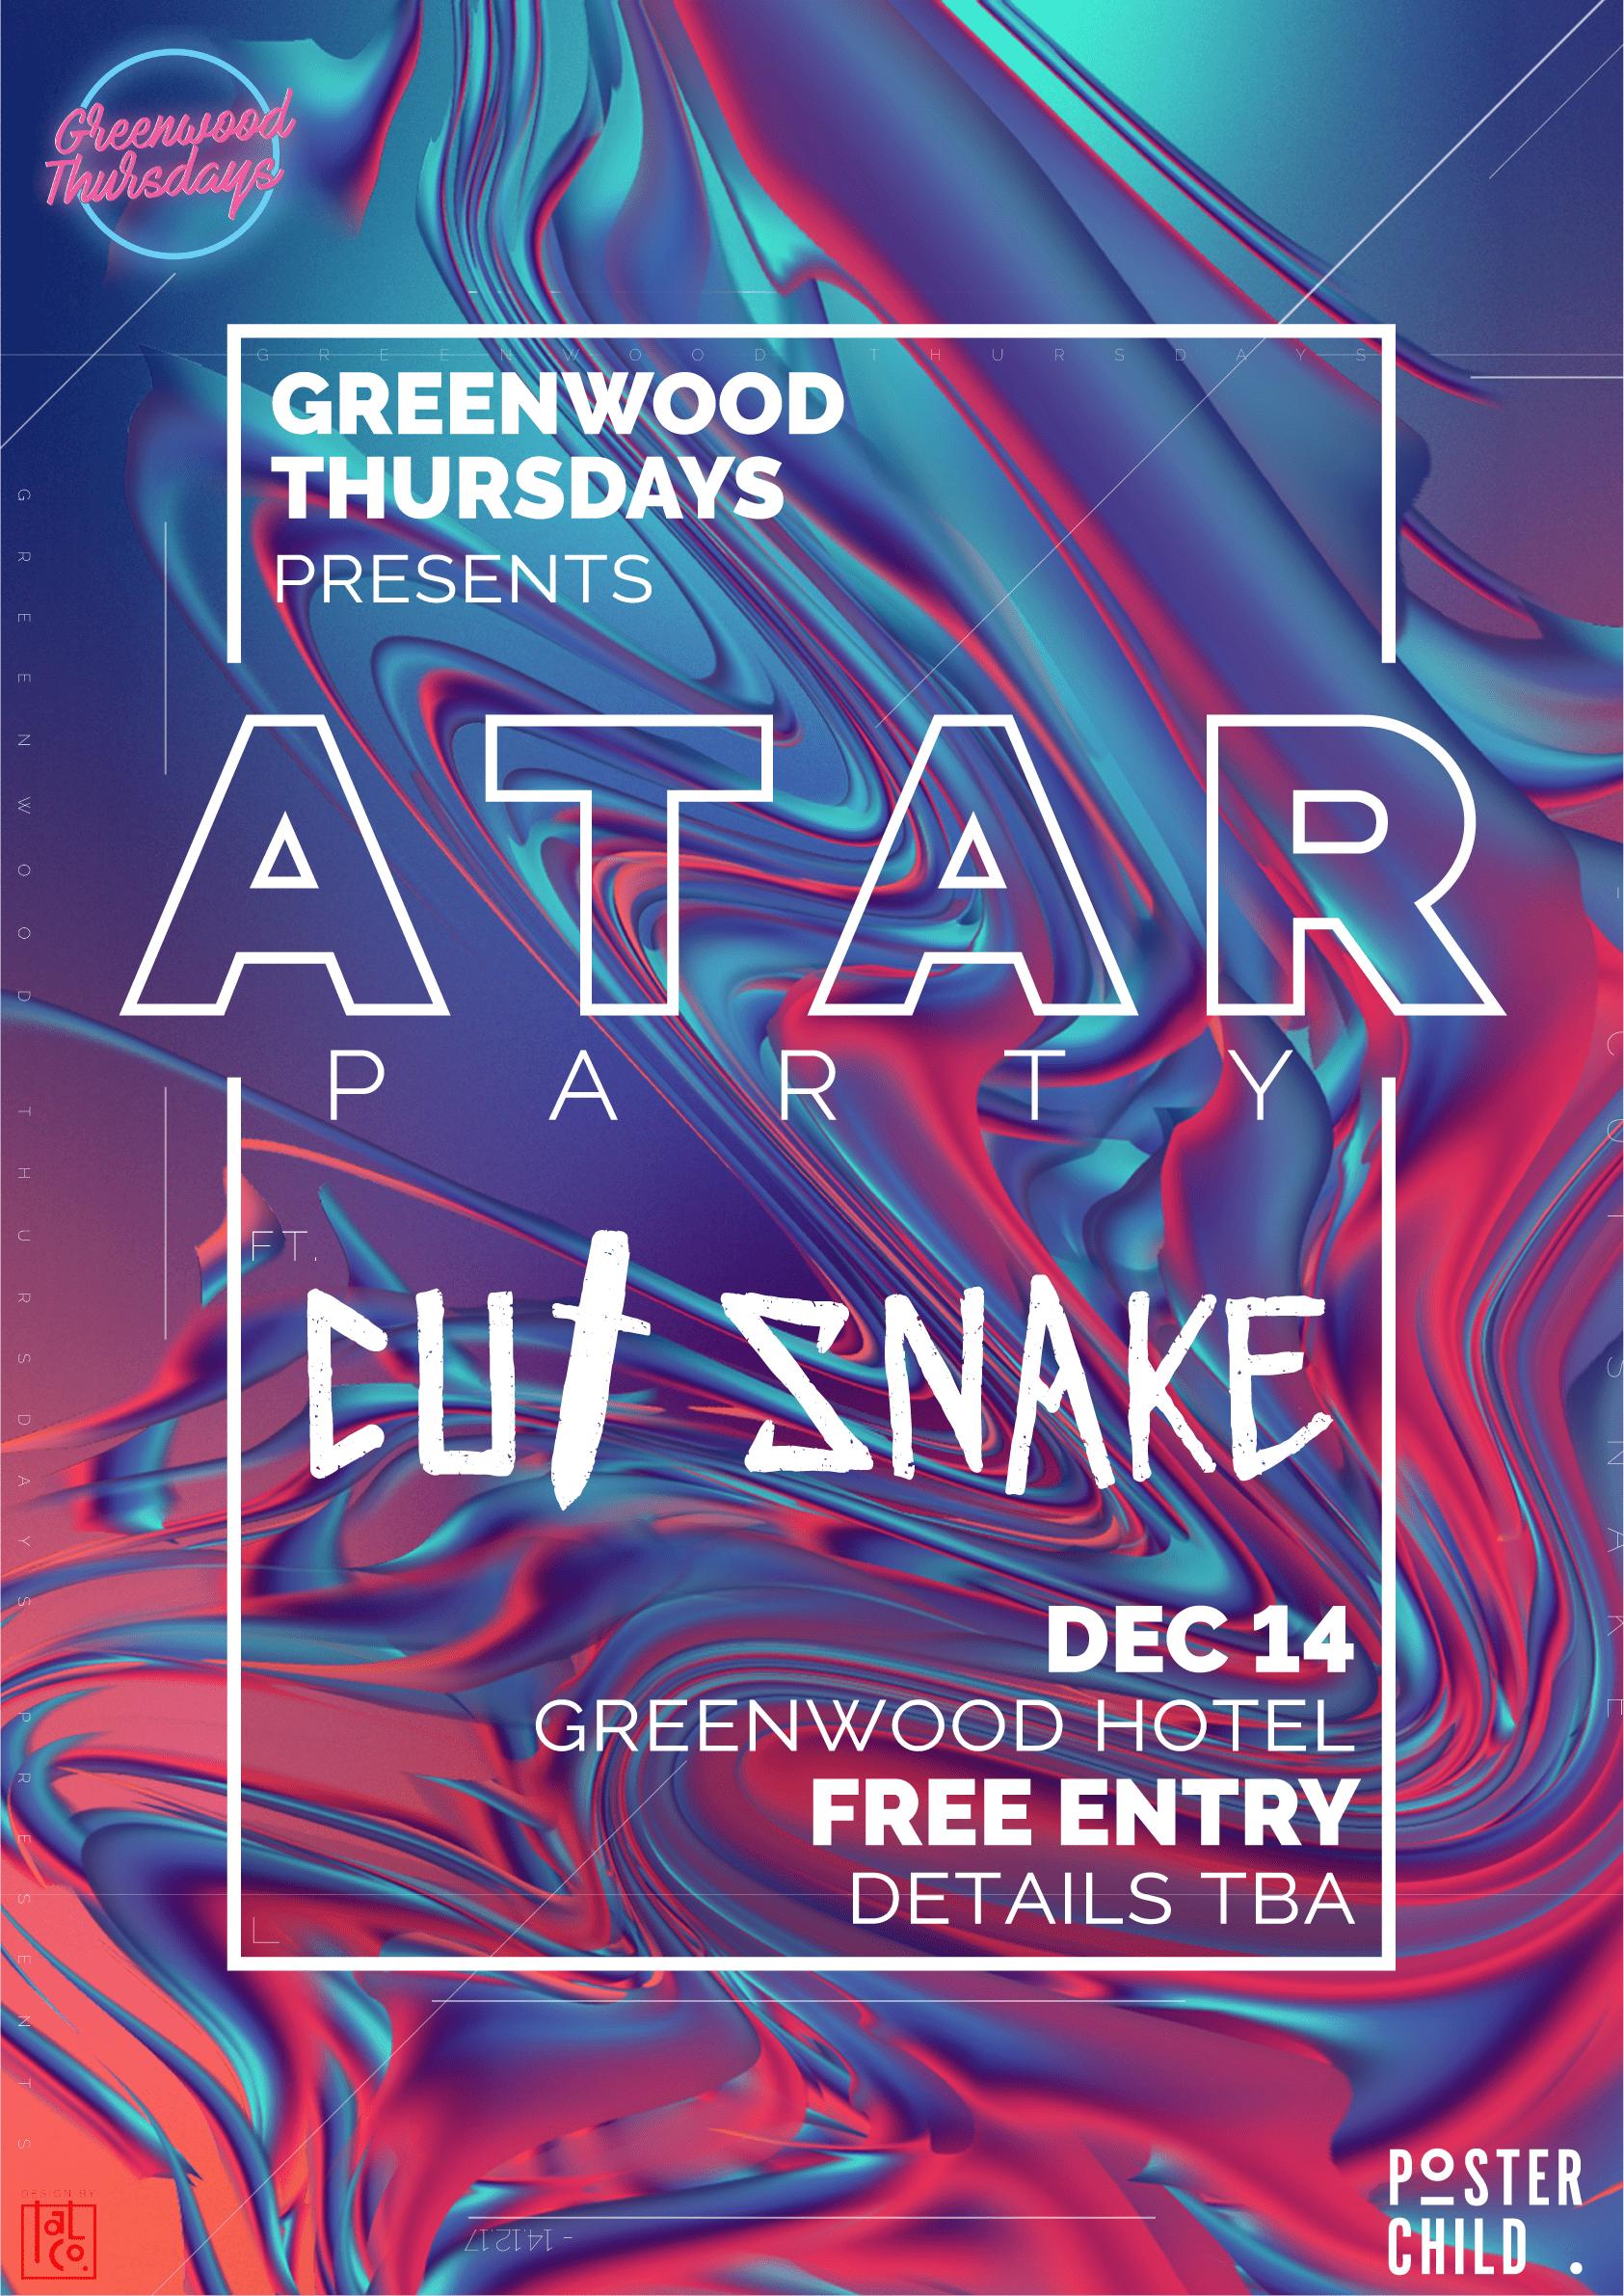 ATAR Party ft Cut Snake Greenwood Thursdays North Sydney